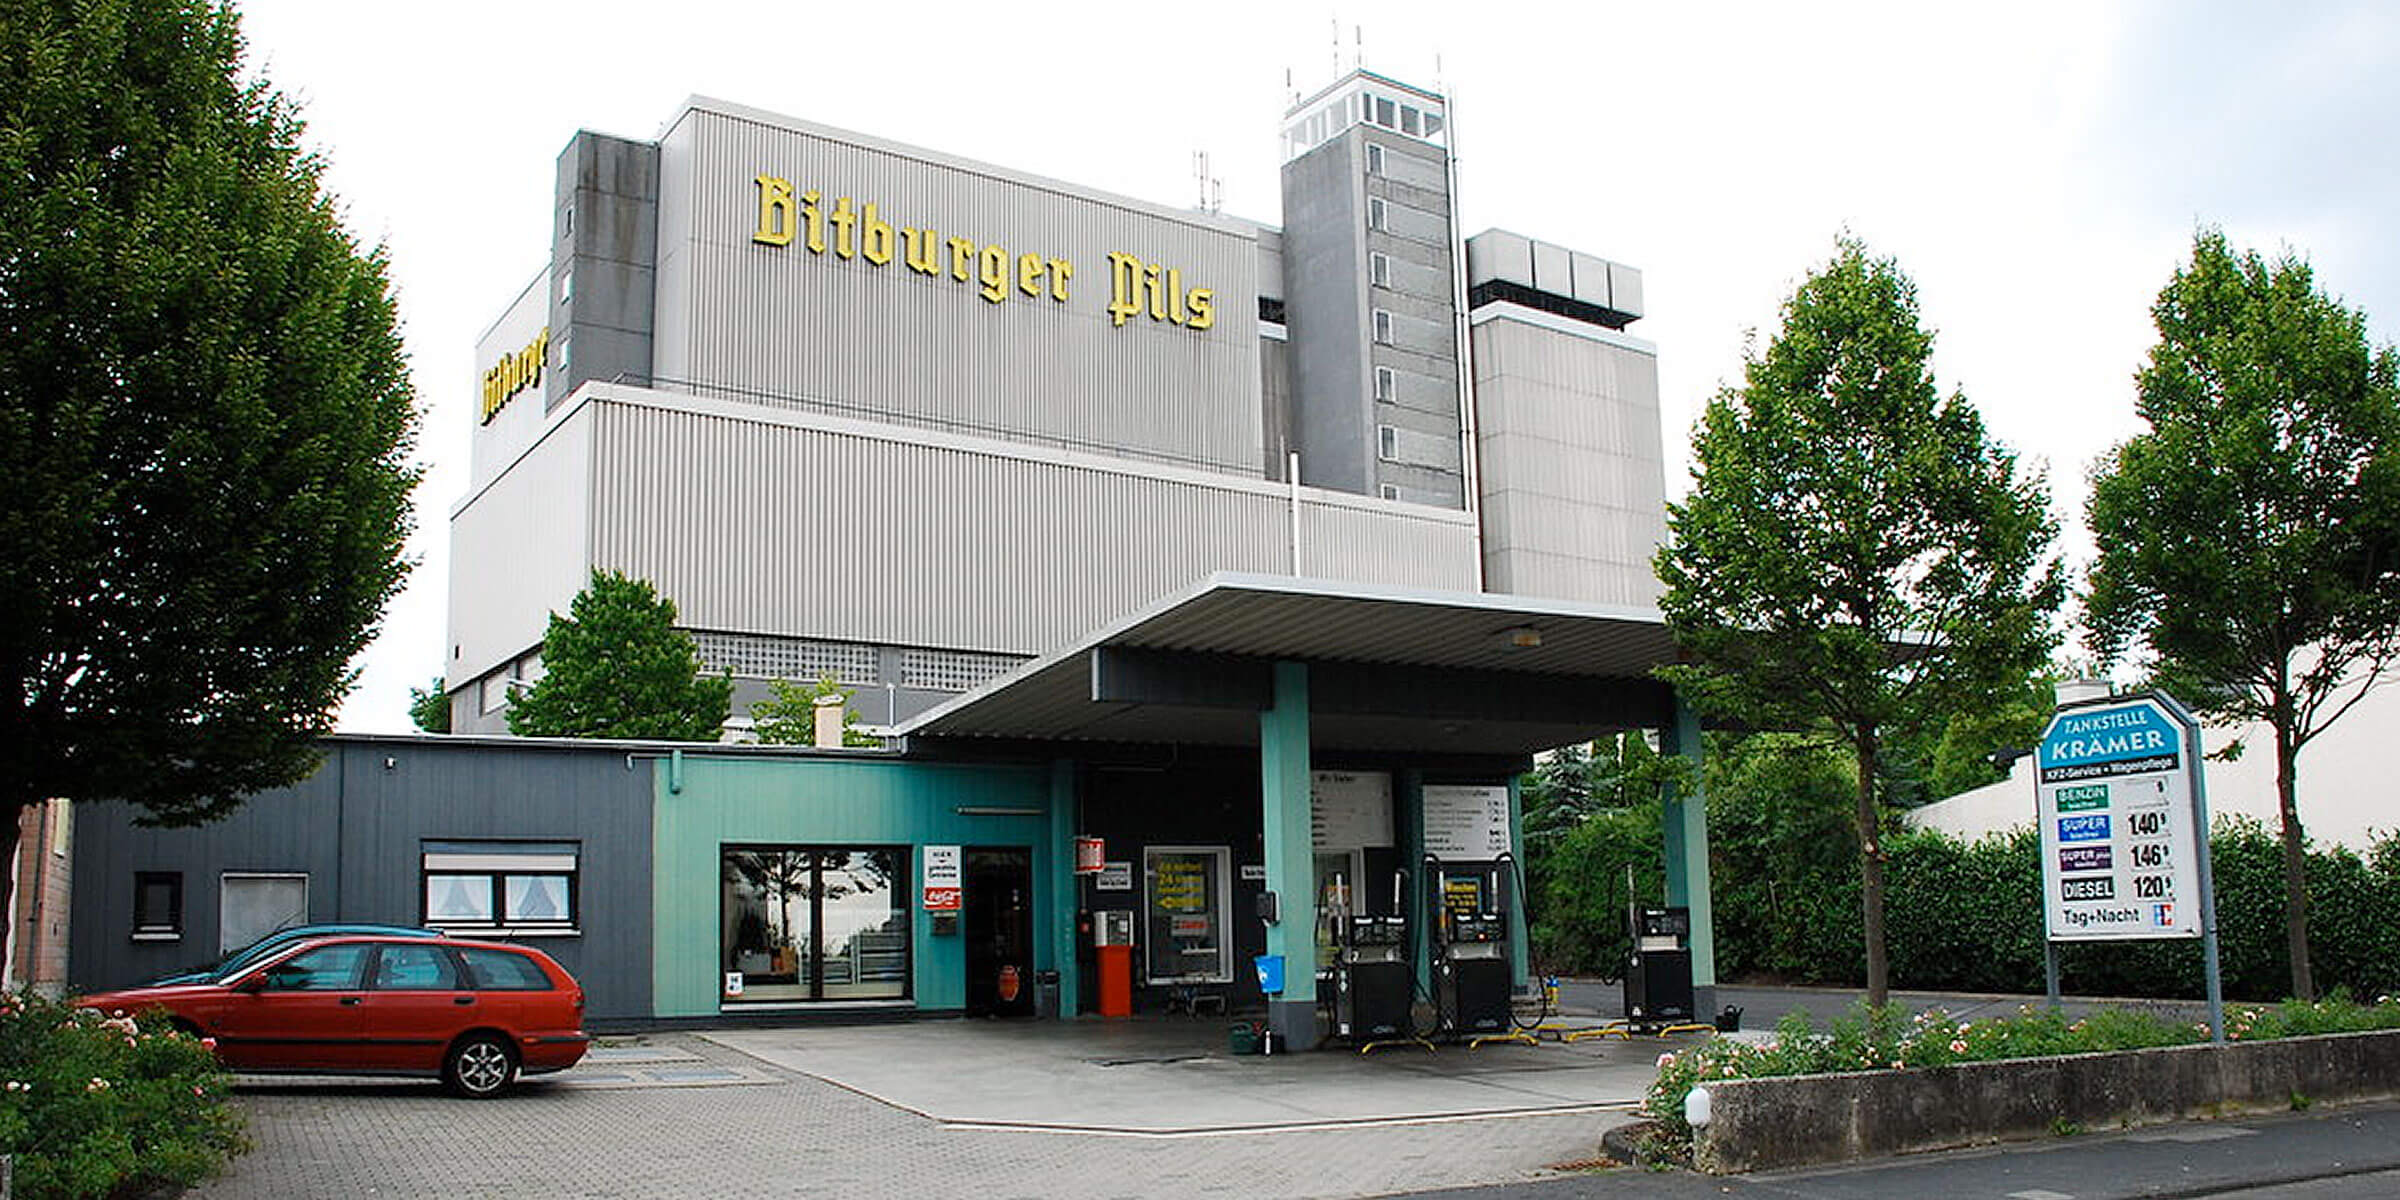 Outside the Bitburger Brauerei headquarters in Bitburg, Rhineland-Palatinate, Germany